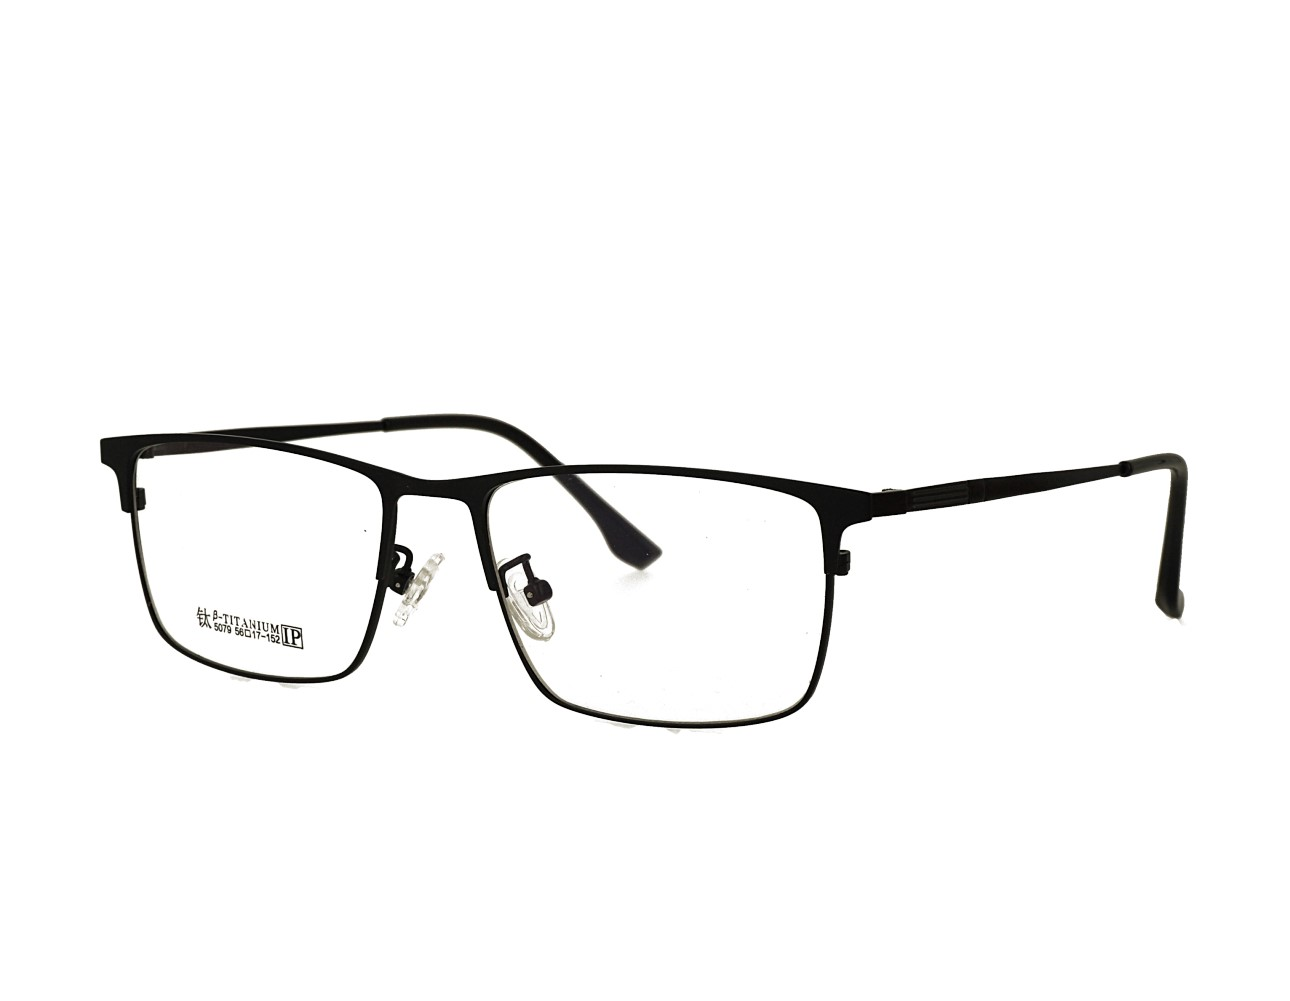 56 Size Rectangle Designer Optical frame Stainless Steal Eyeglasses Mans Eyewear